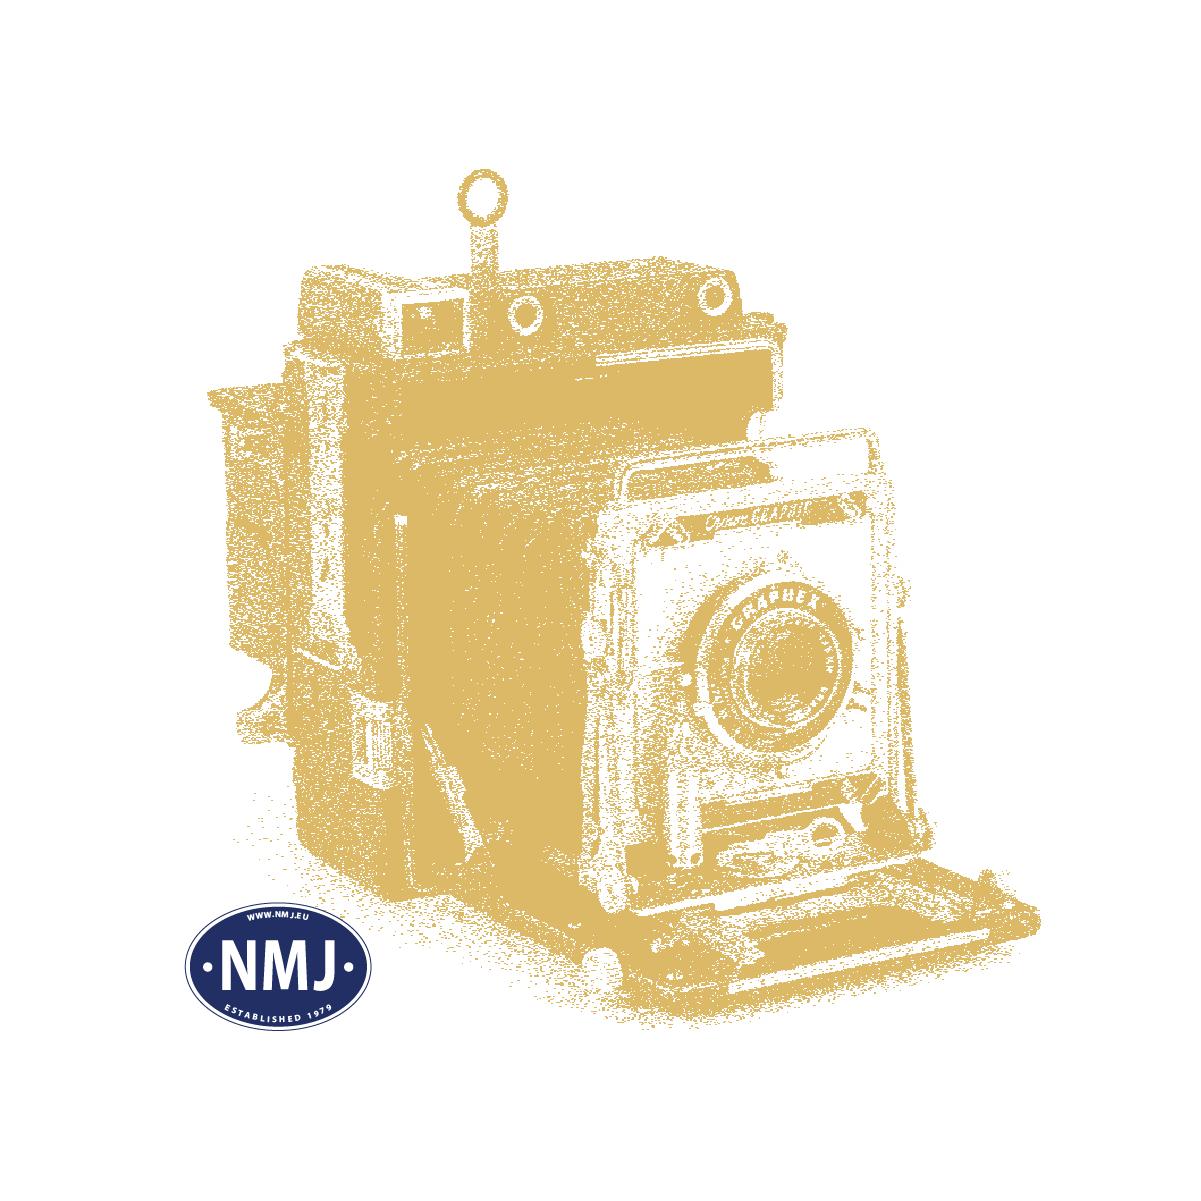 NMJ Superline NSB Type 21b 225 Museumslok